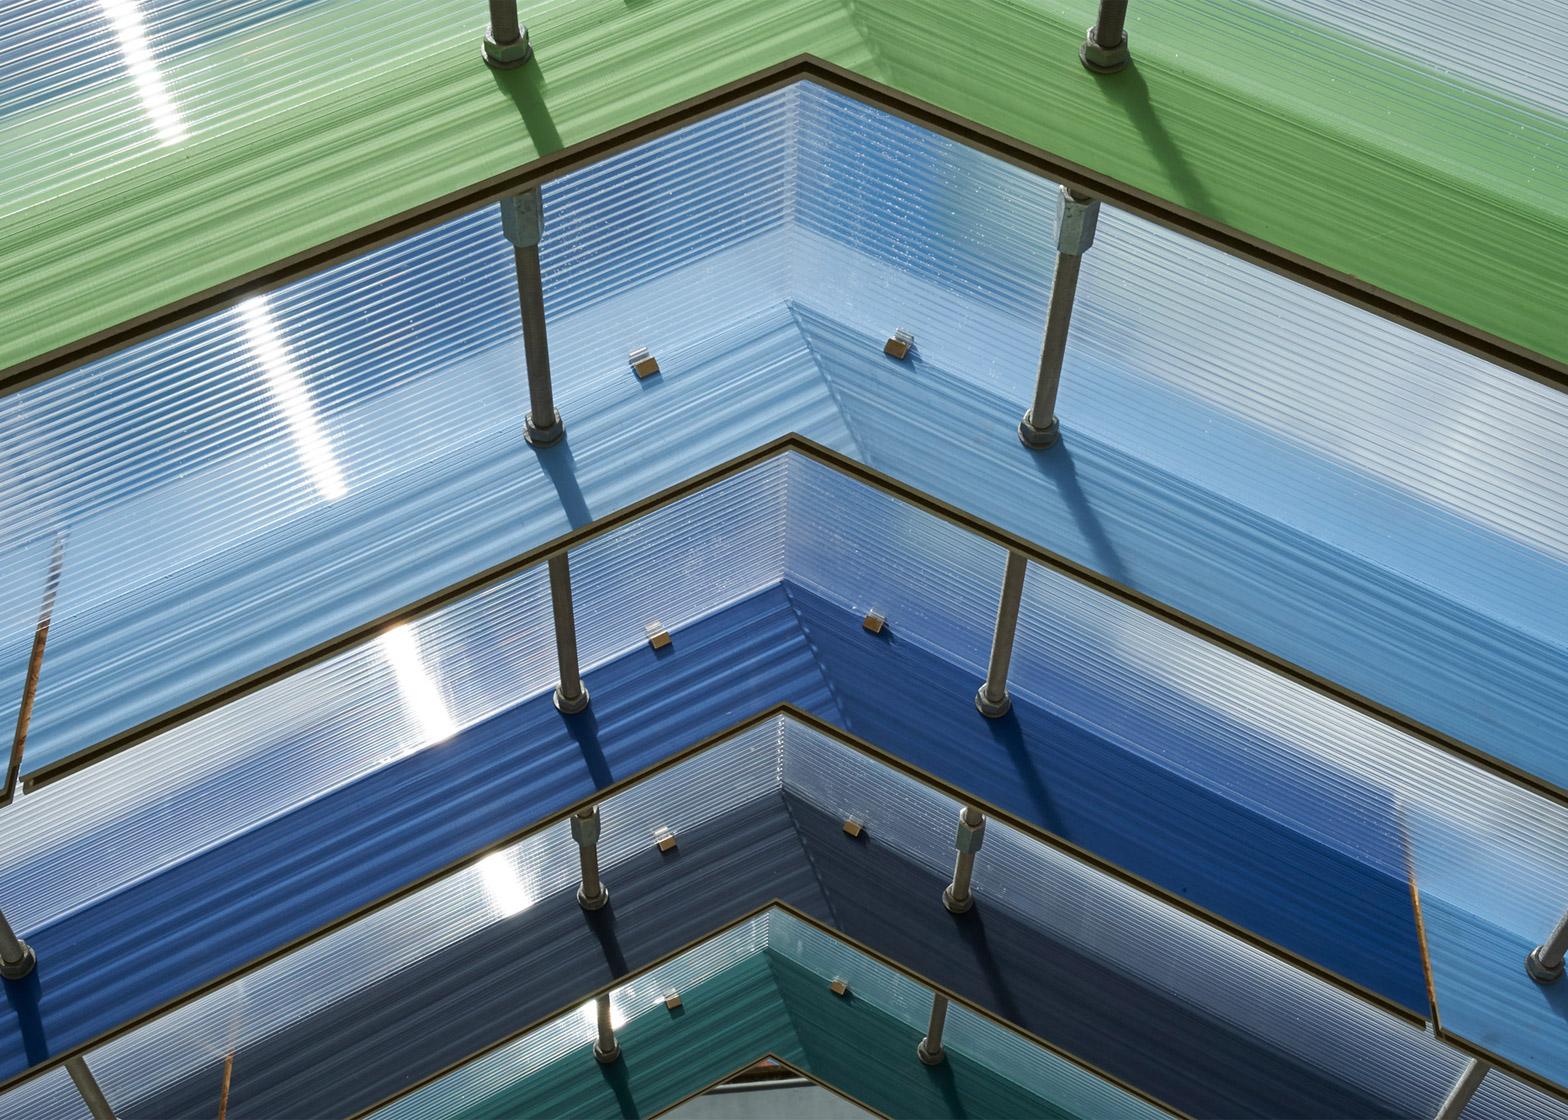 Architecture at Clerkenwell Design Week 2016: Museum of Making pavilion by White Arkitekten